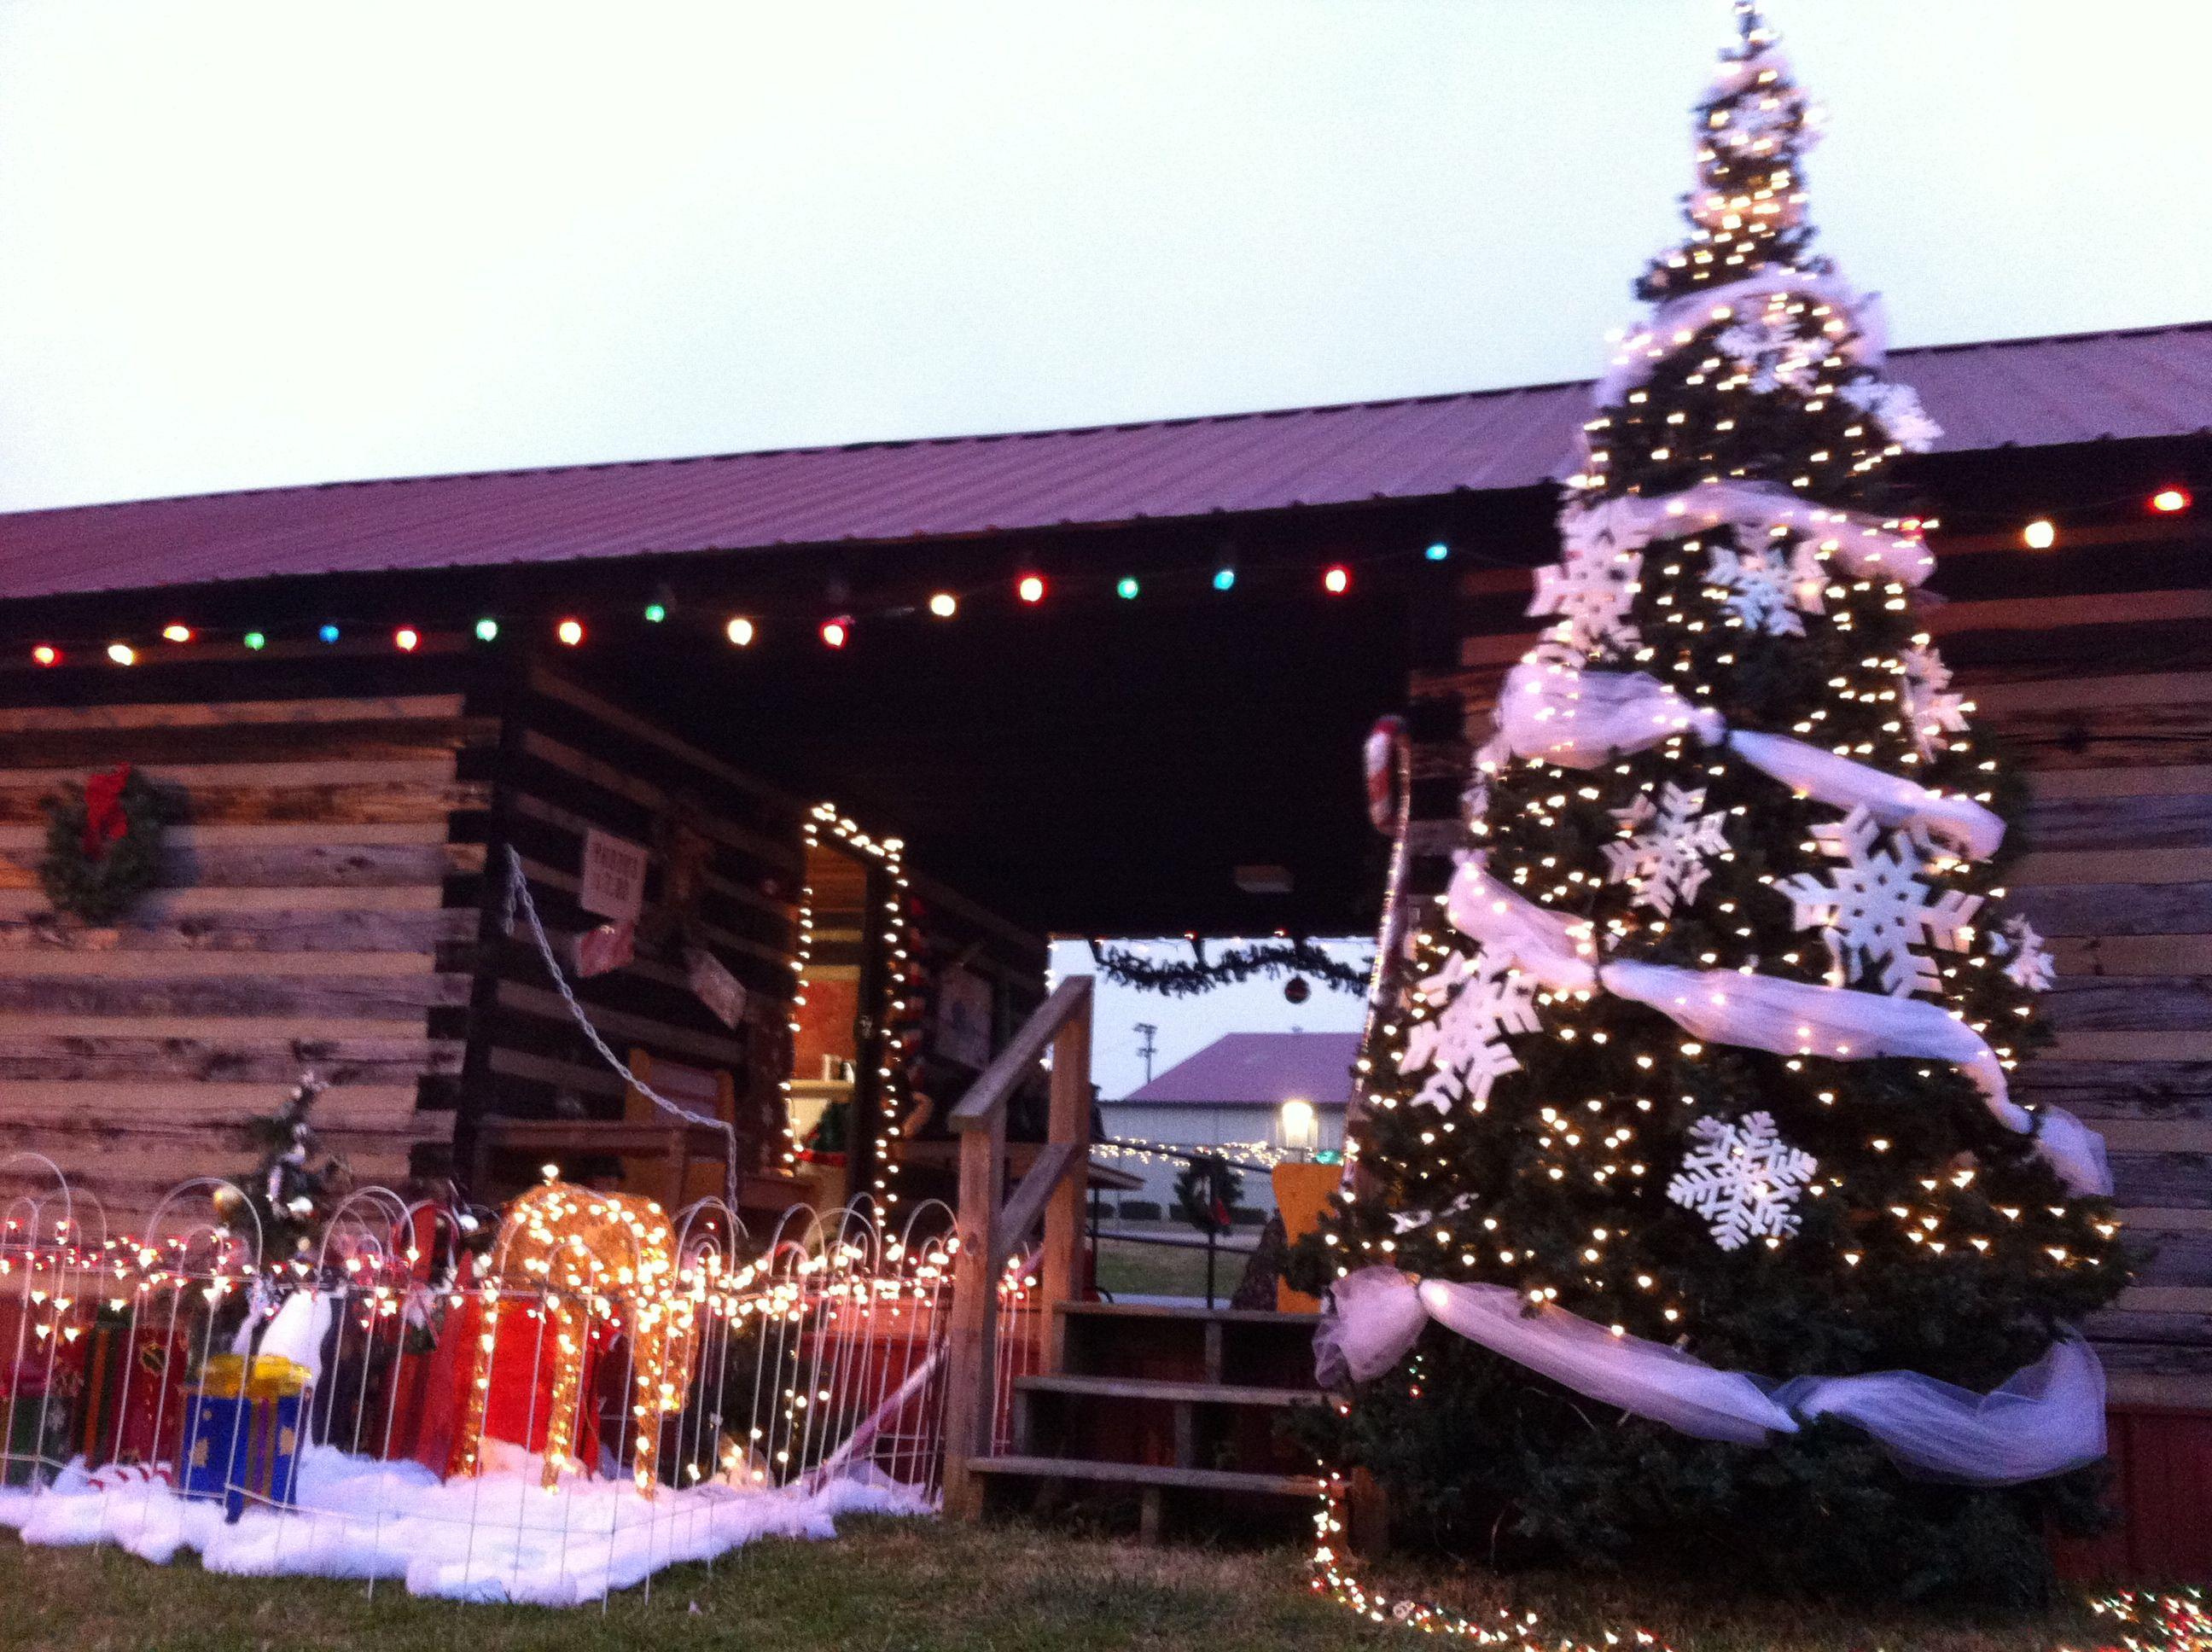 thomas kinkade holiday reflections christmas tree